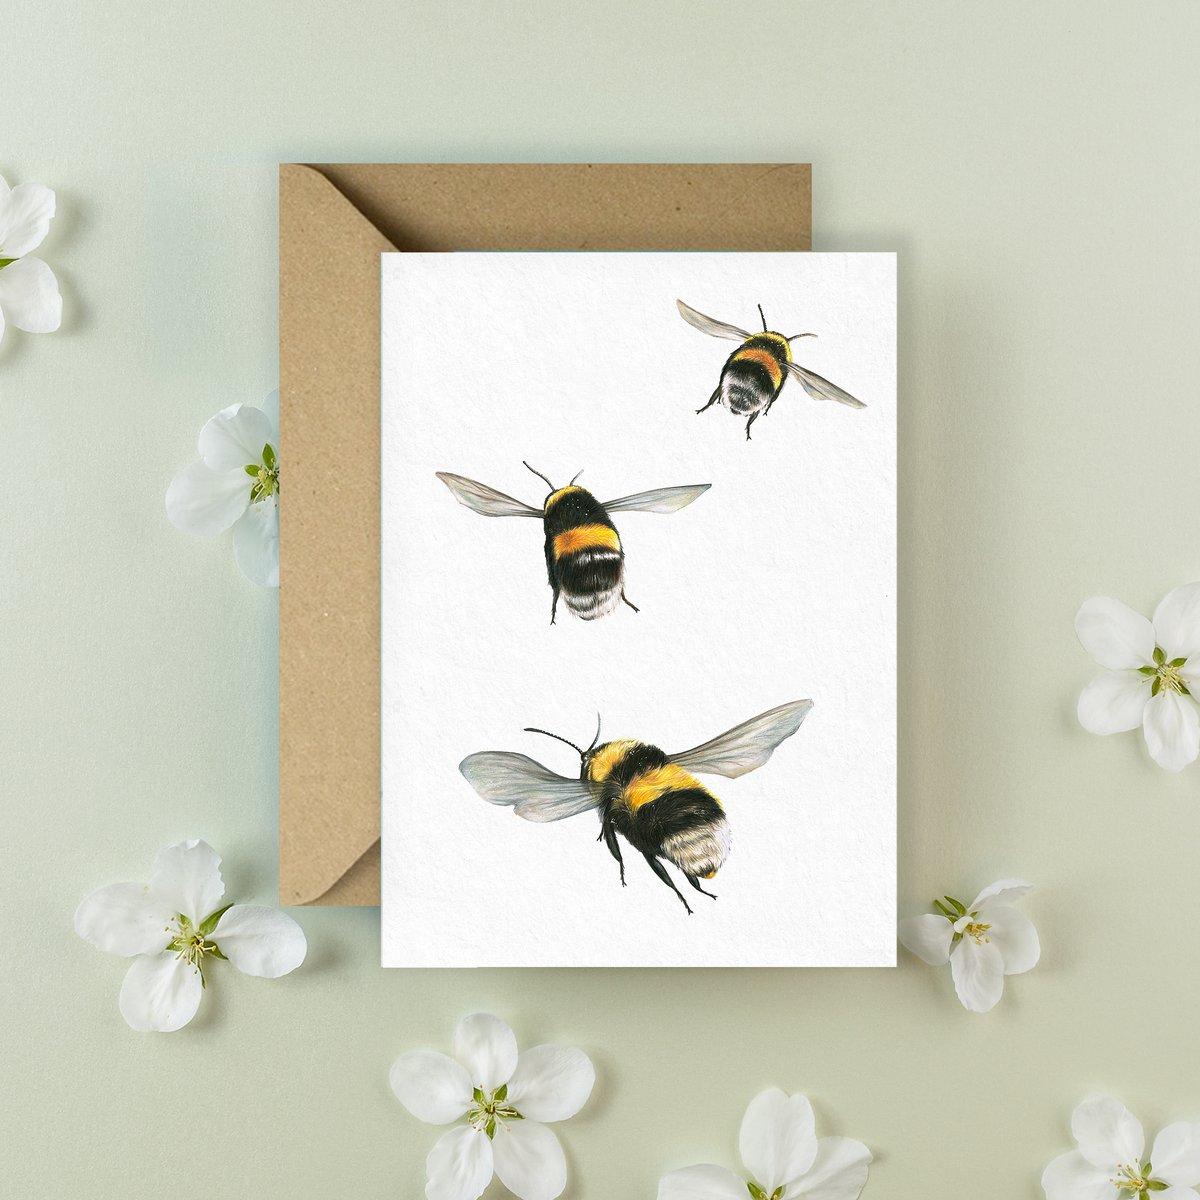 Image of 'Bumblebee' Greeting Card